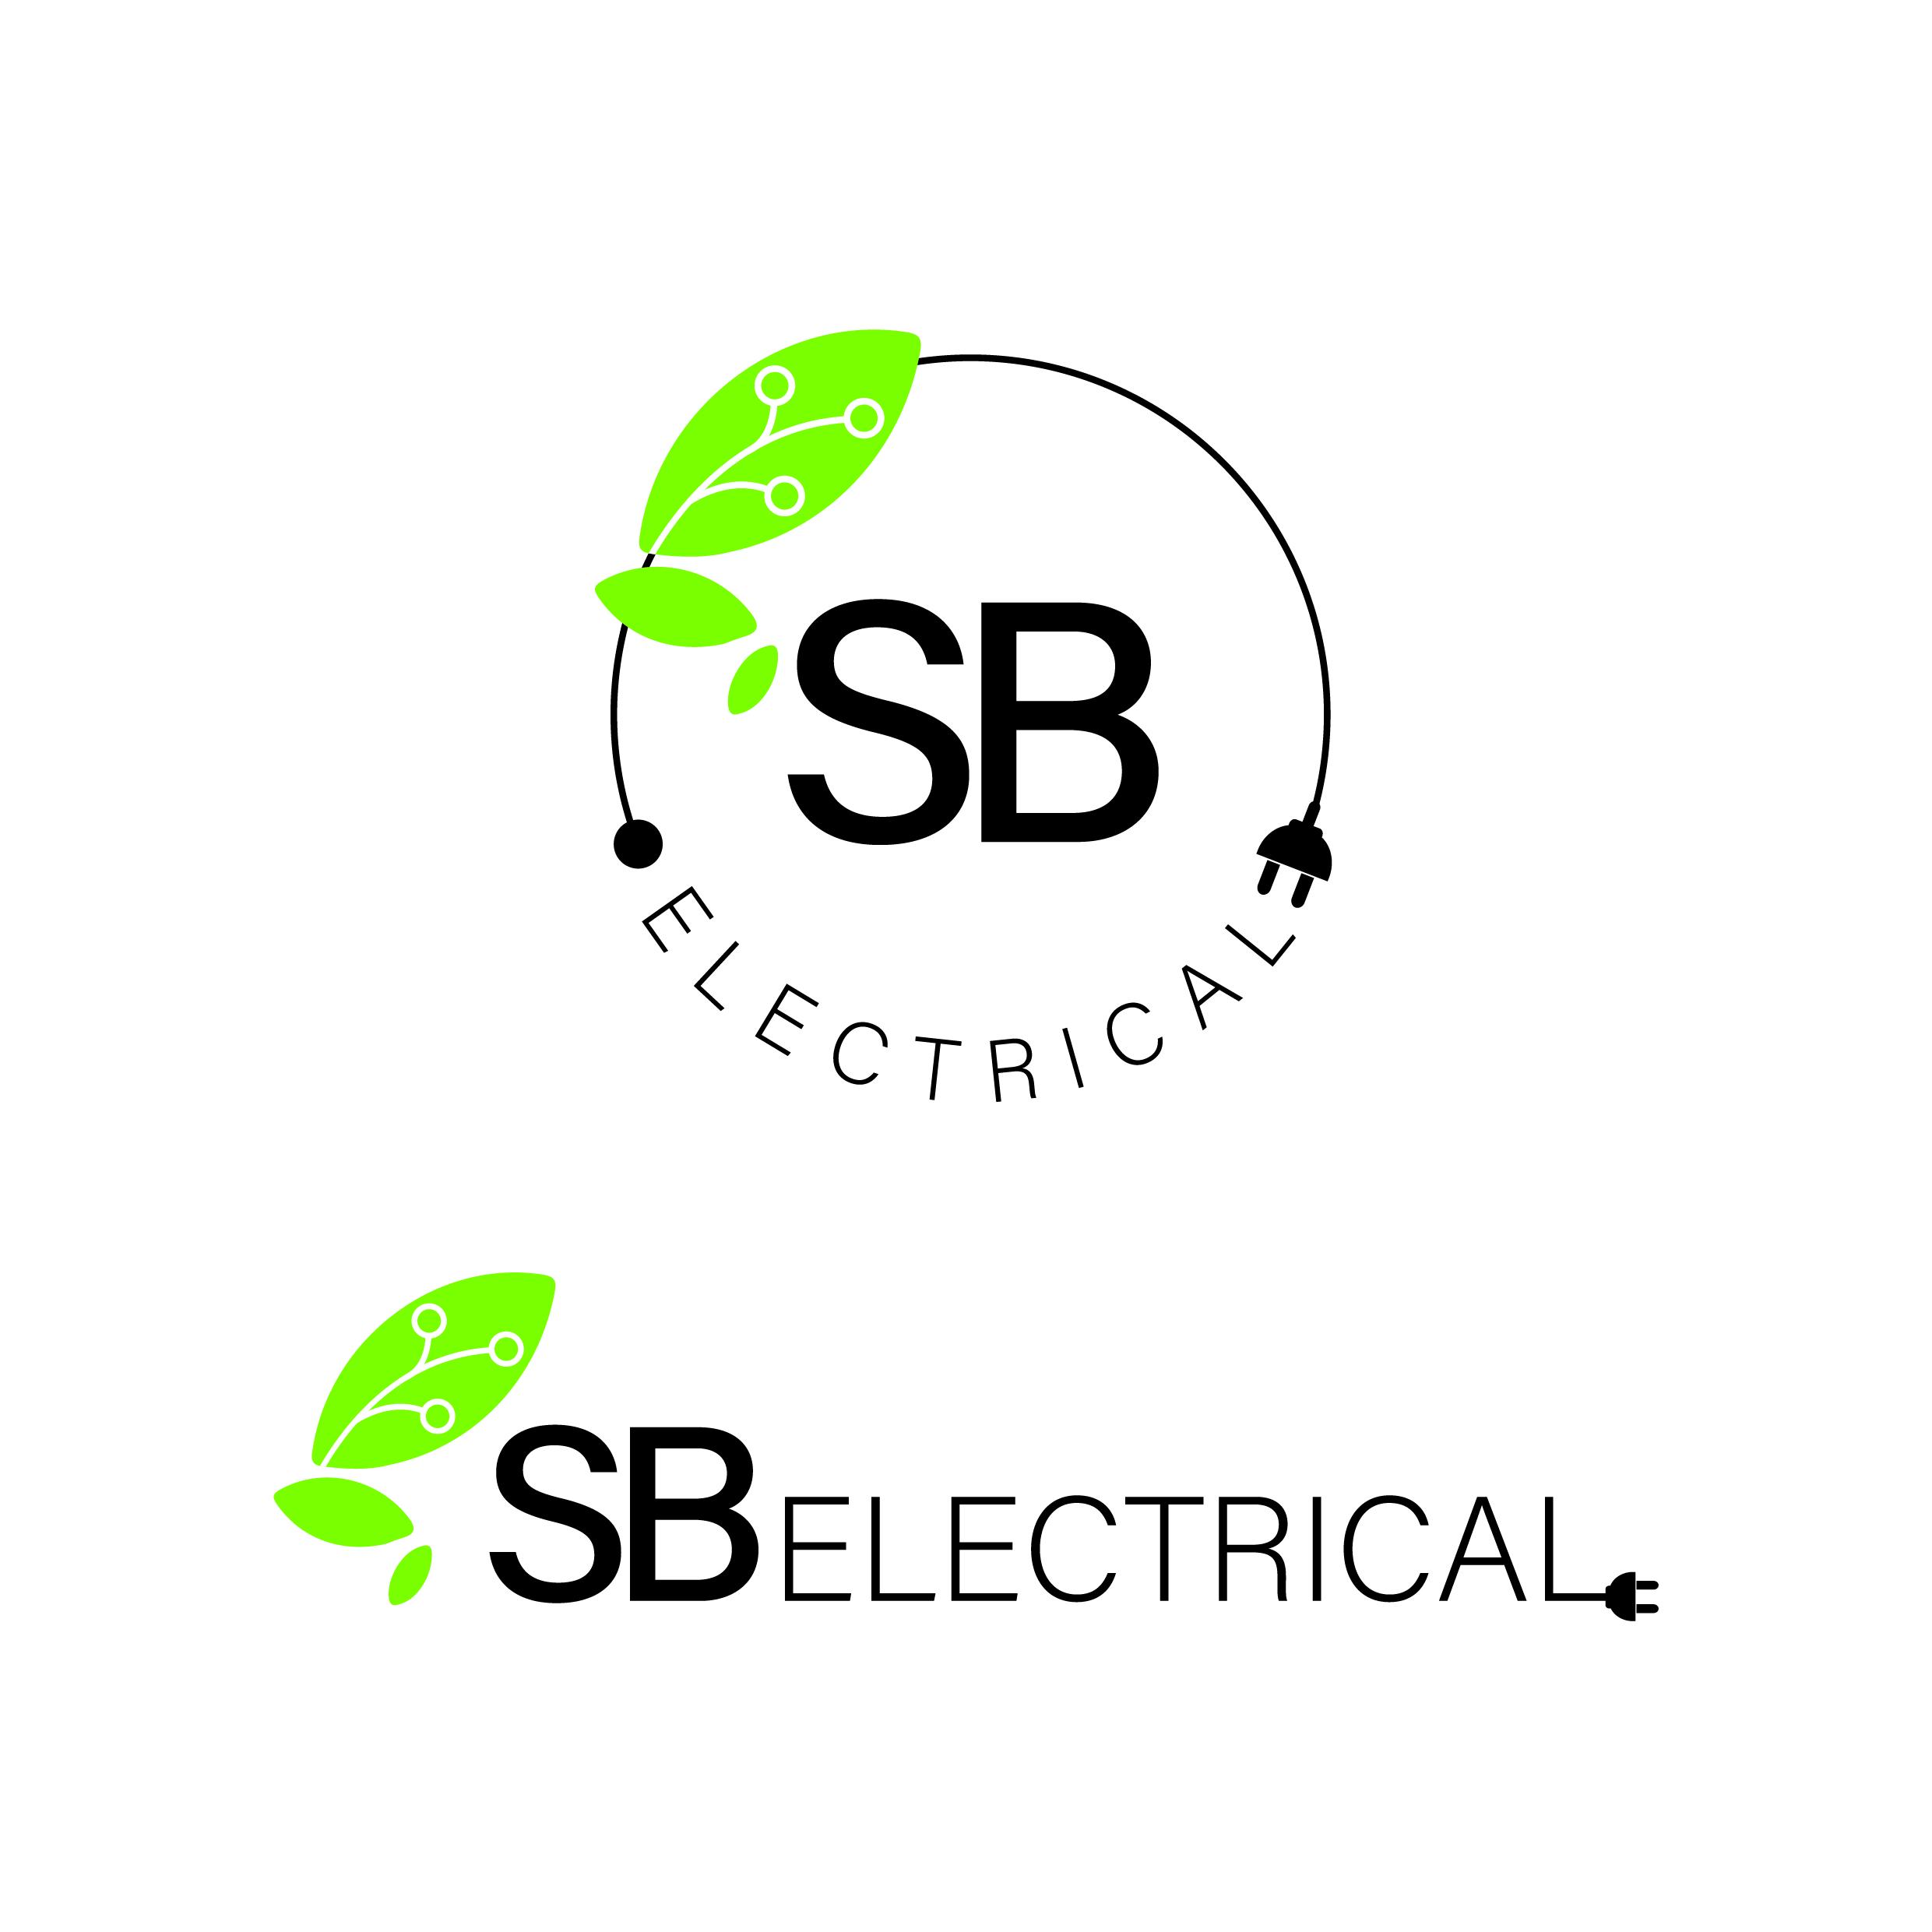 SB Electrical